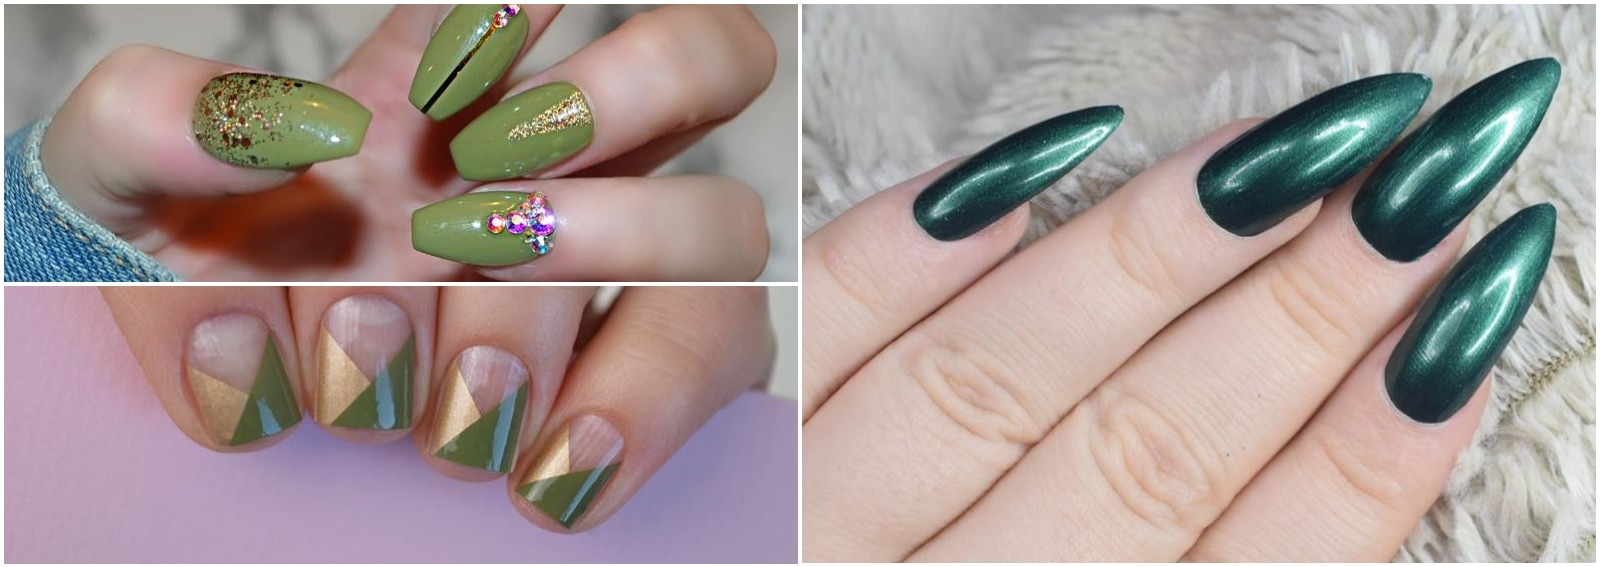 unghie verdi idee nail art foto autunno inverno 2019 2020 cover dekstop